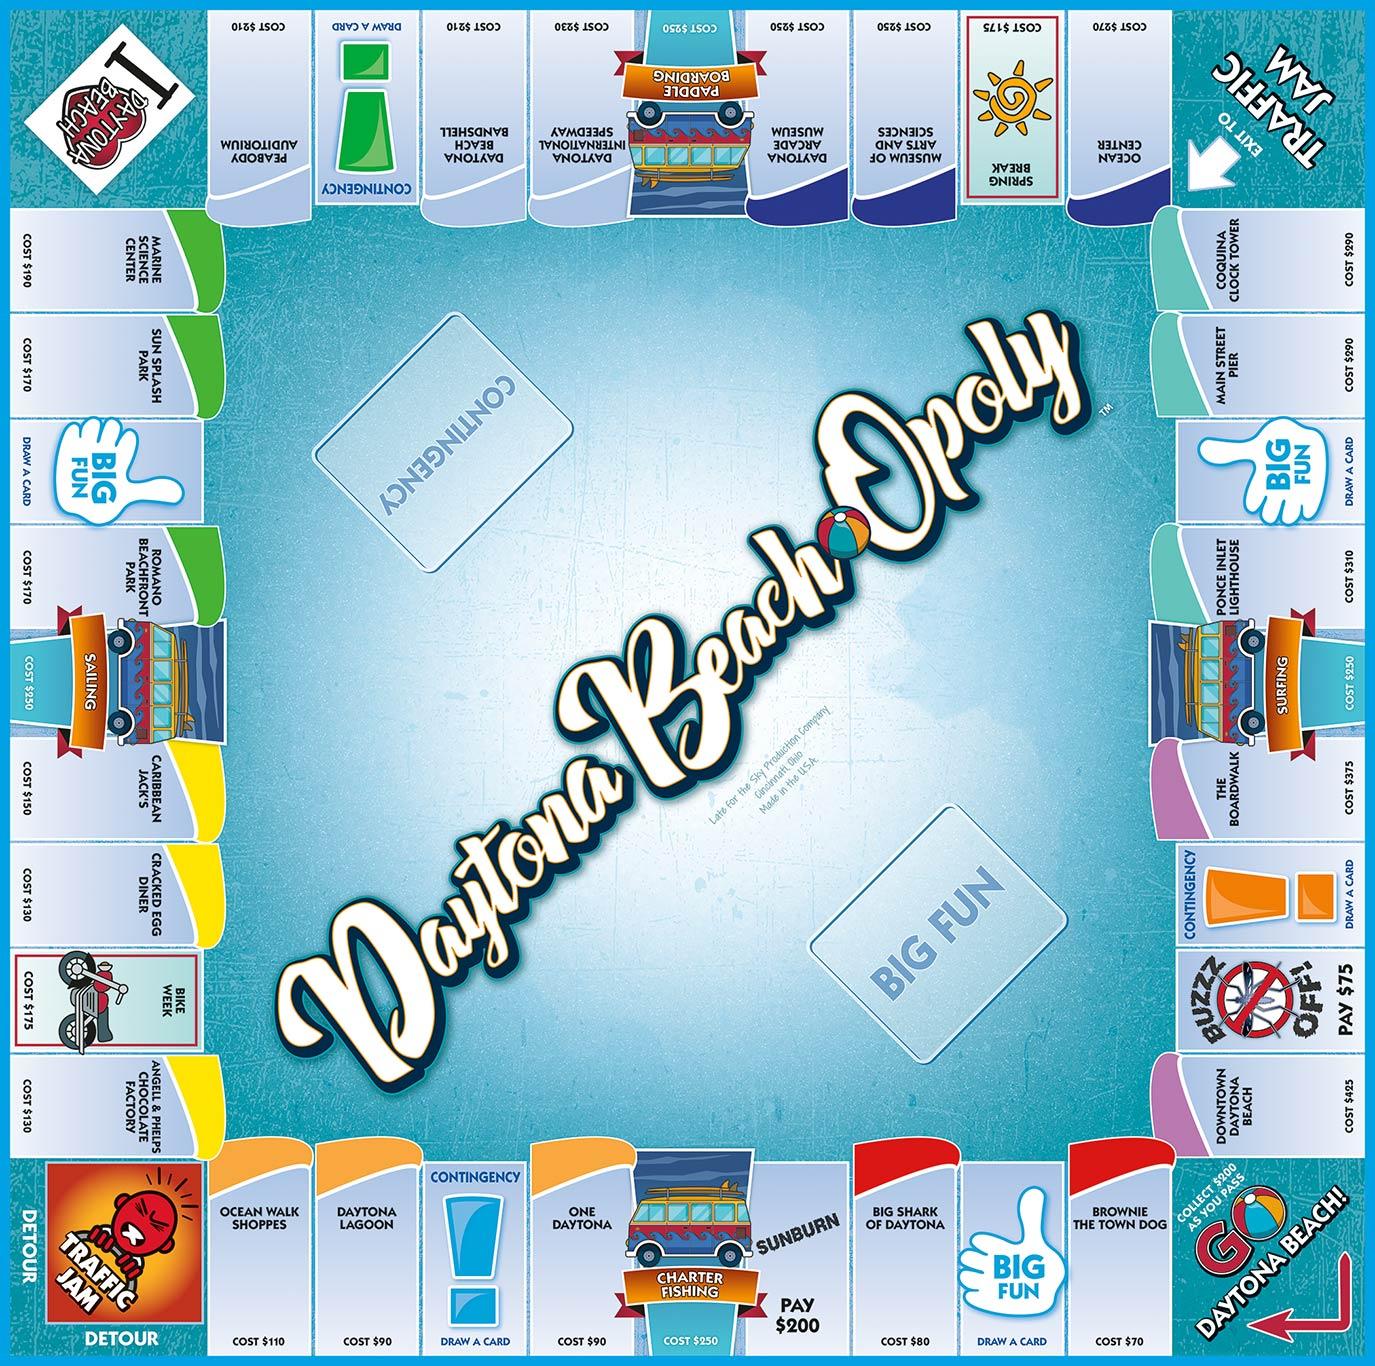 DAYTONA BEACH-OPOLY Board Game